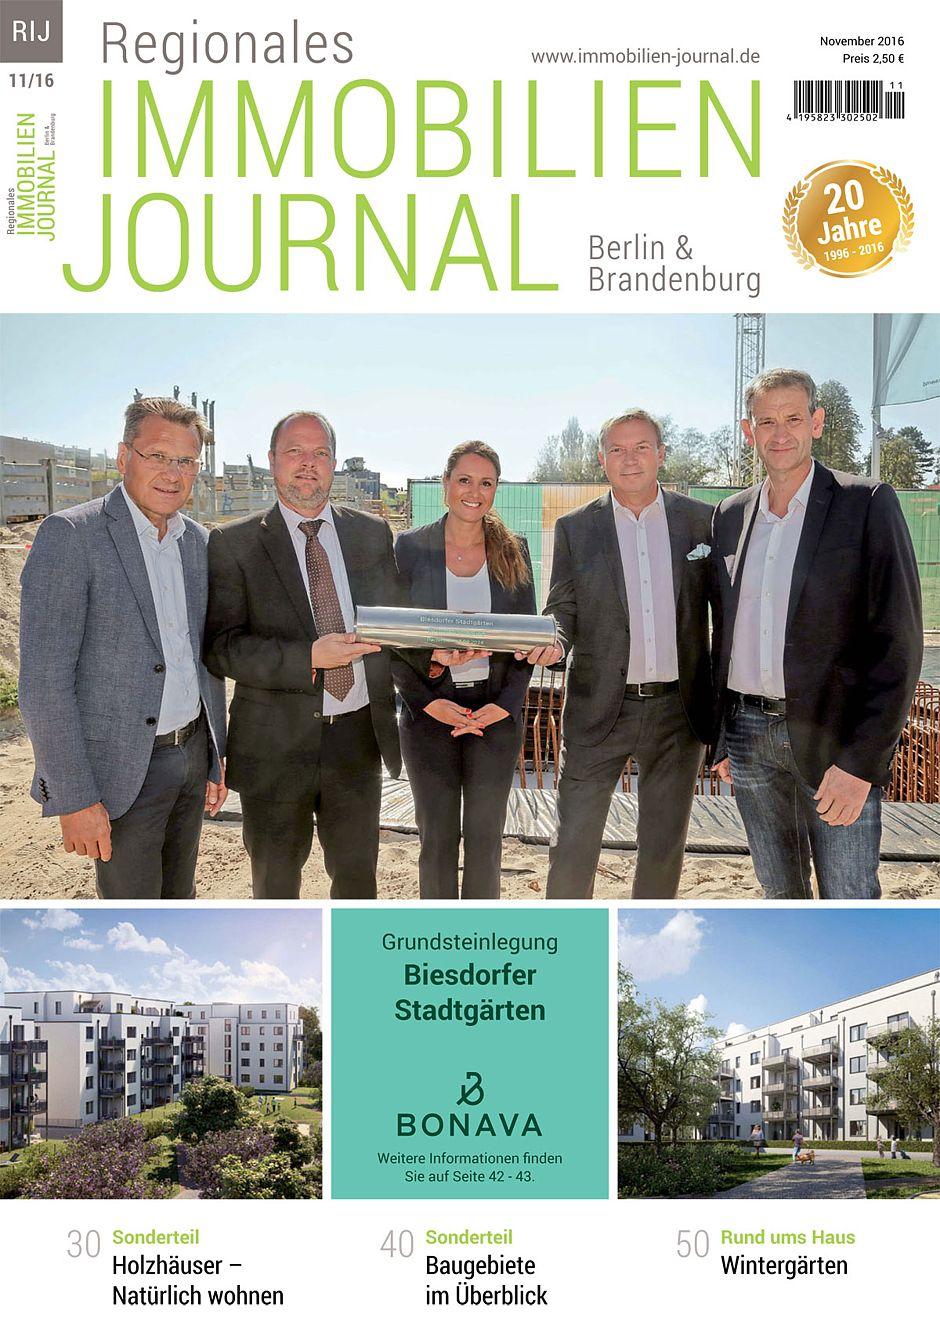 Regionales Immobilien Journal Berlin-Brandenburg November 2016